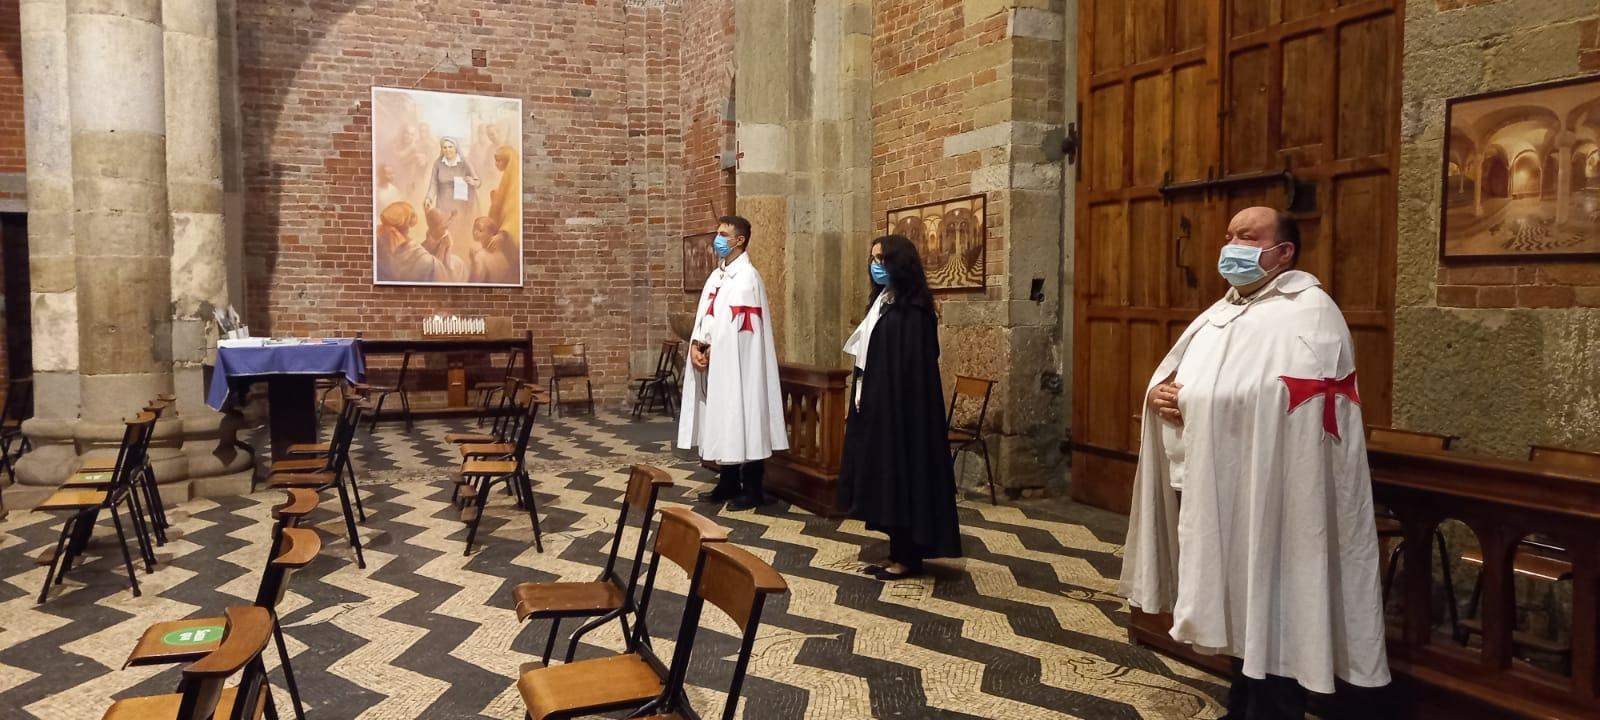 Custodia Chiesa di San Savino – Piacenza 25.09.2021